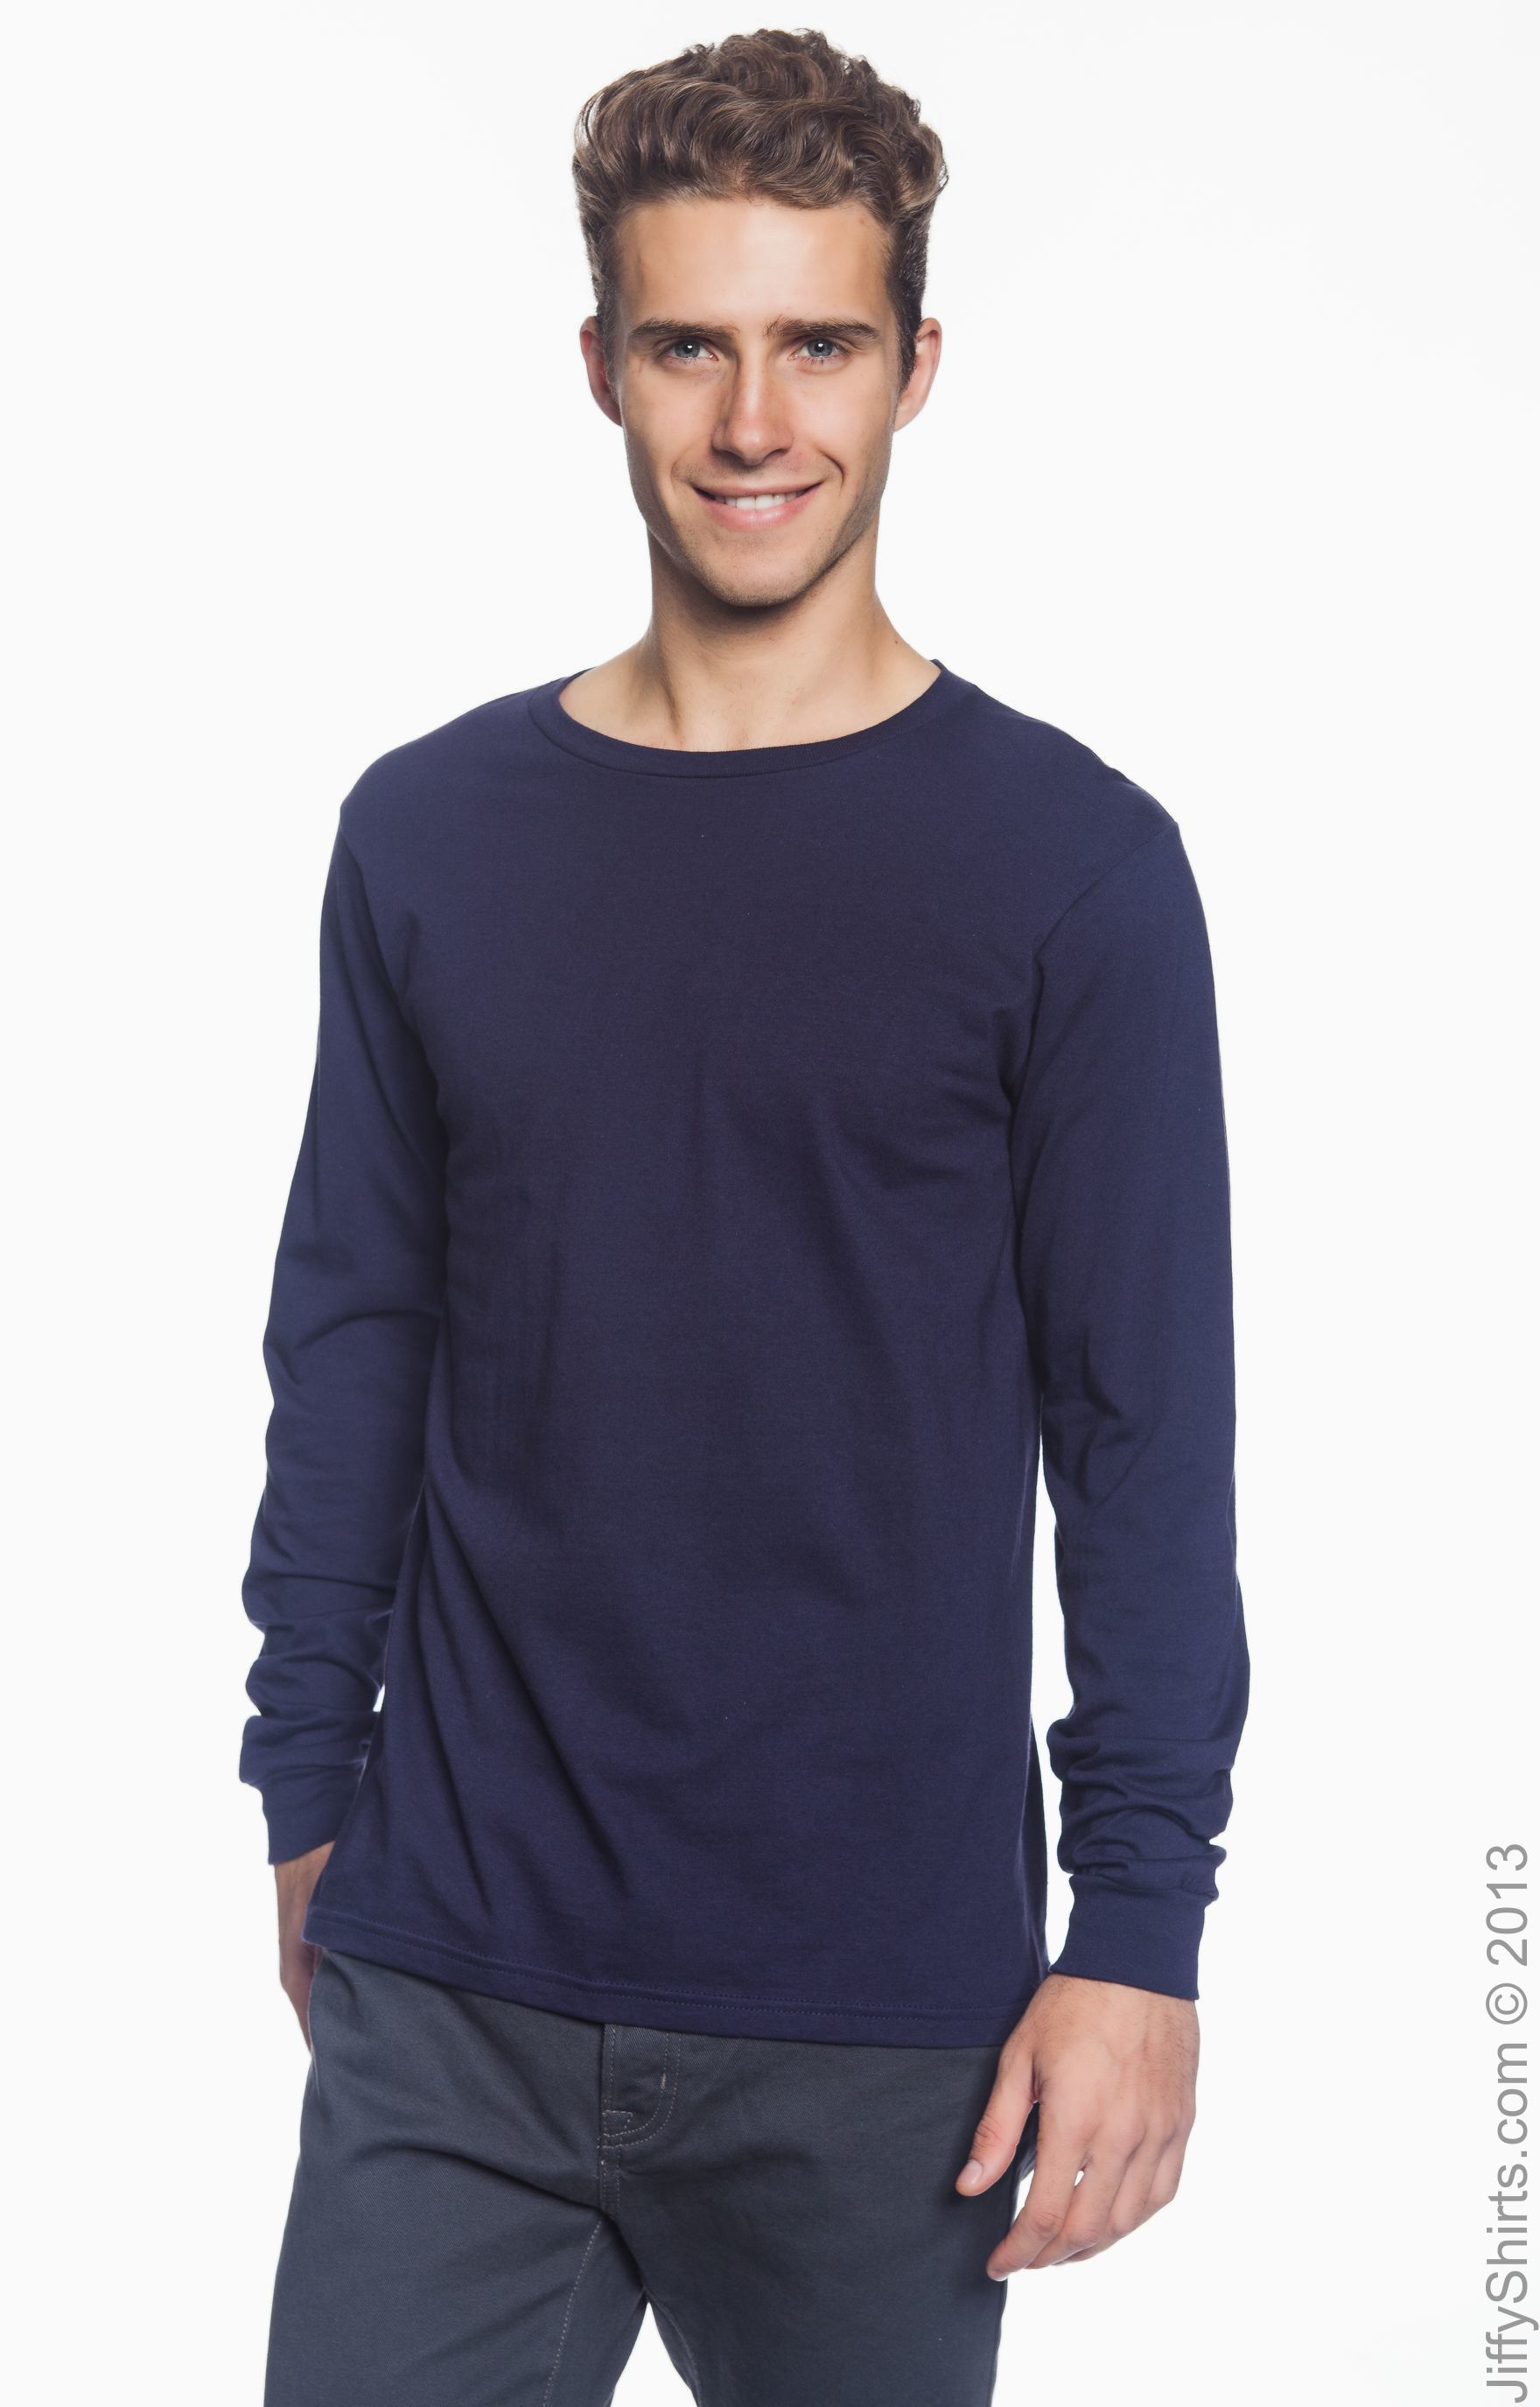 Fruit of the Loom Mens Long Sleeve Value T Shirt Dark Heather 3XL